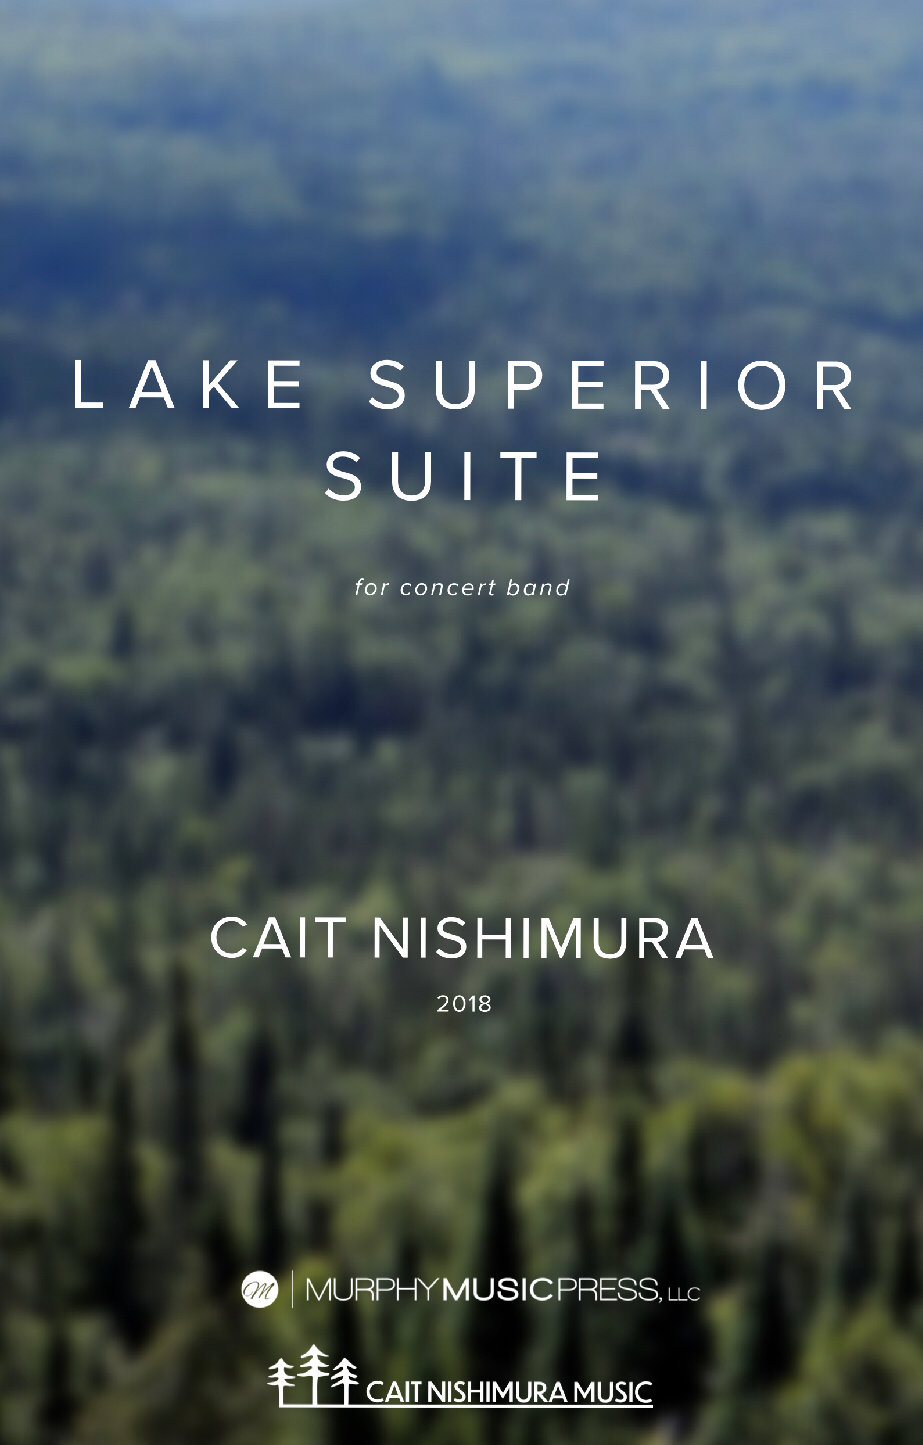 Lake Superior Suite by Cait Nishimura